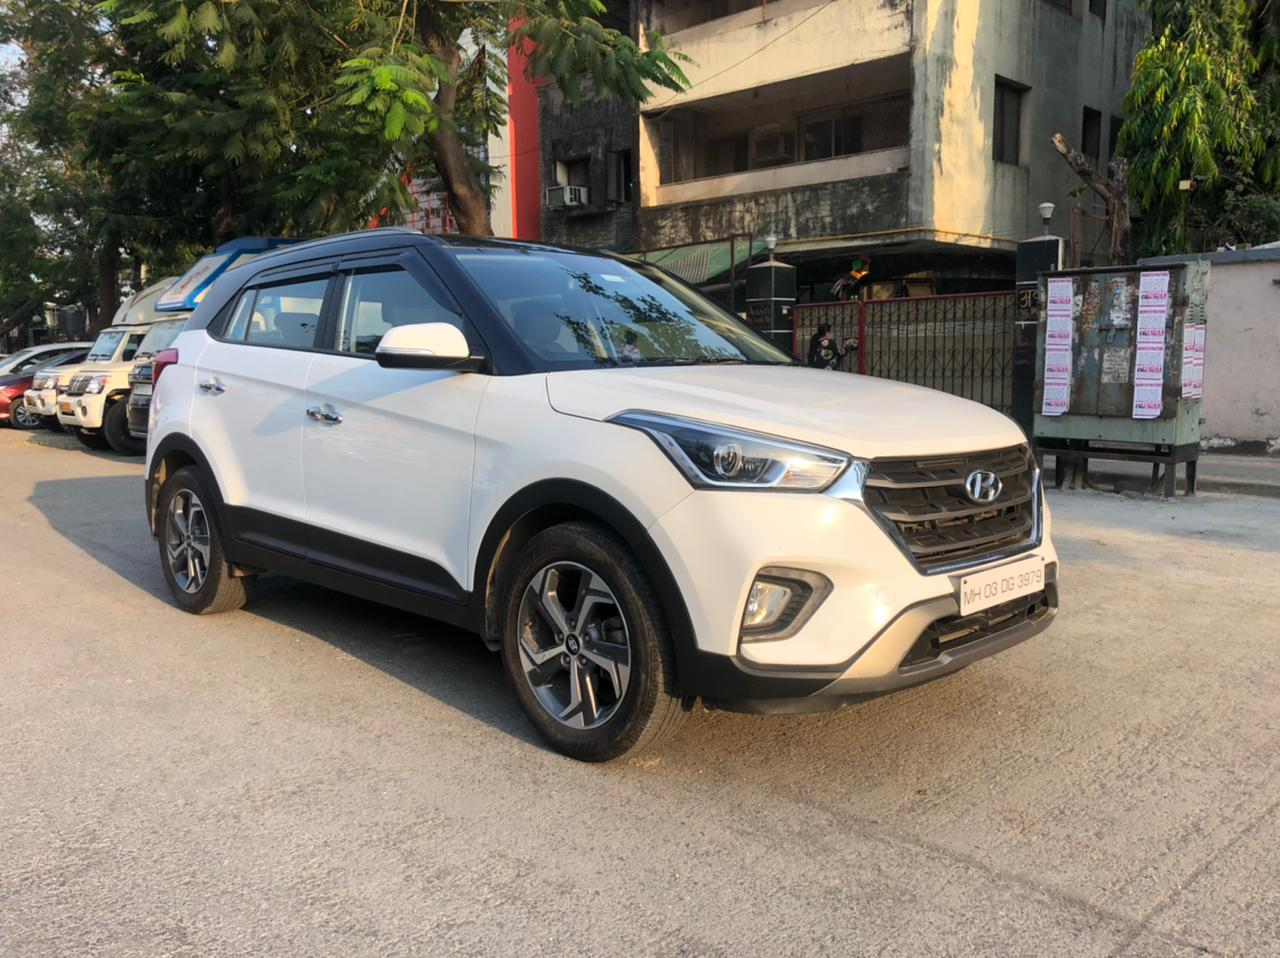 2019 Used Hyundai Creta SX 1.6 DUAL TONE PETROL